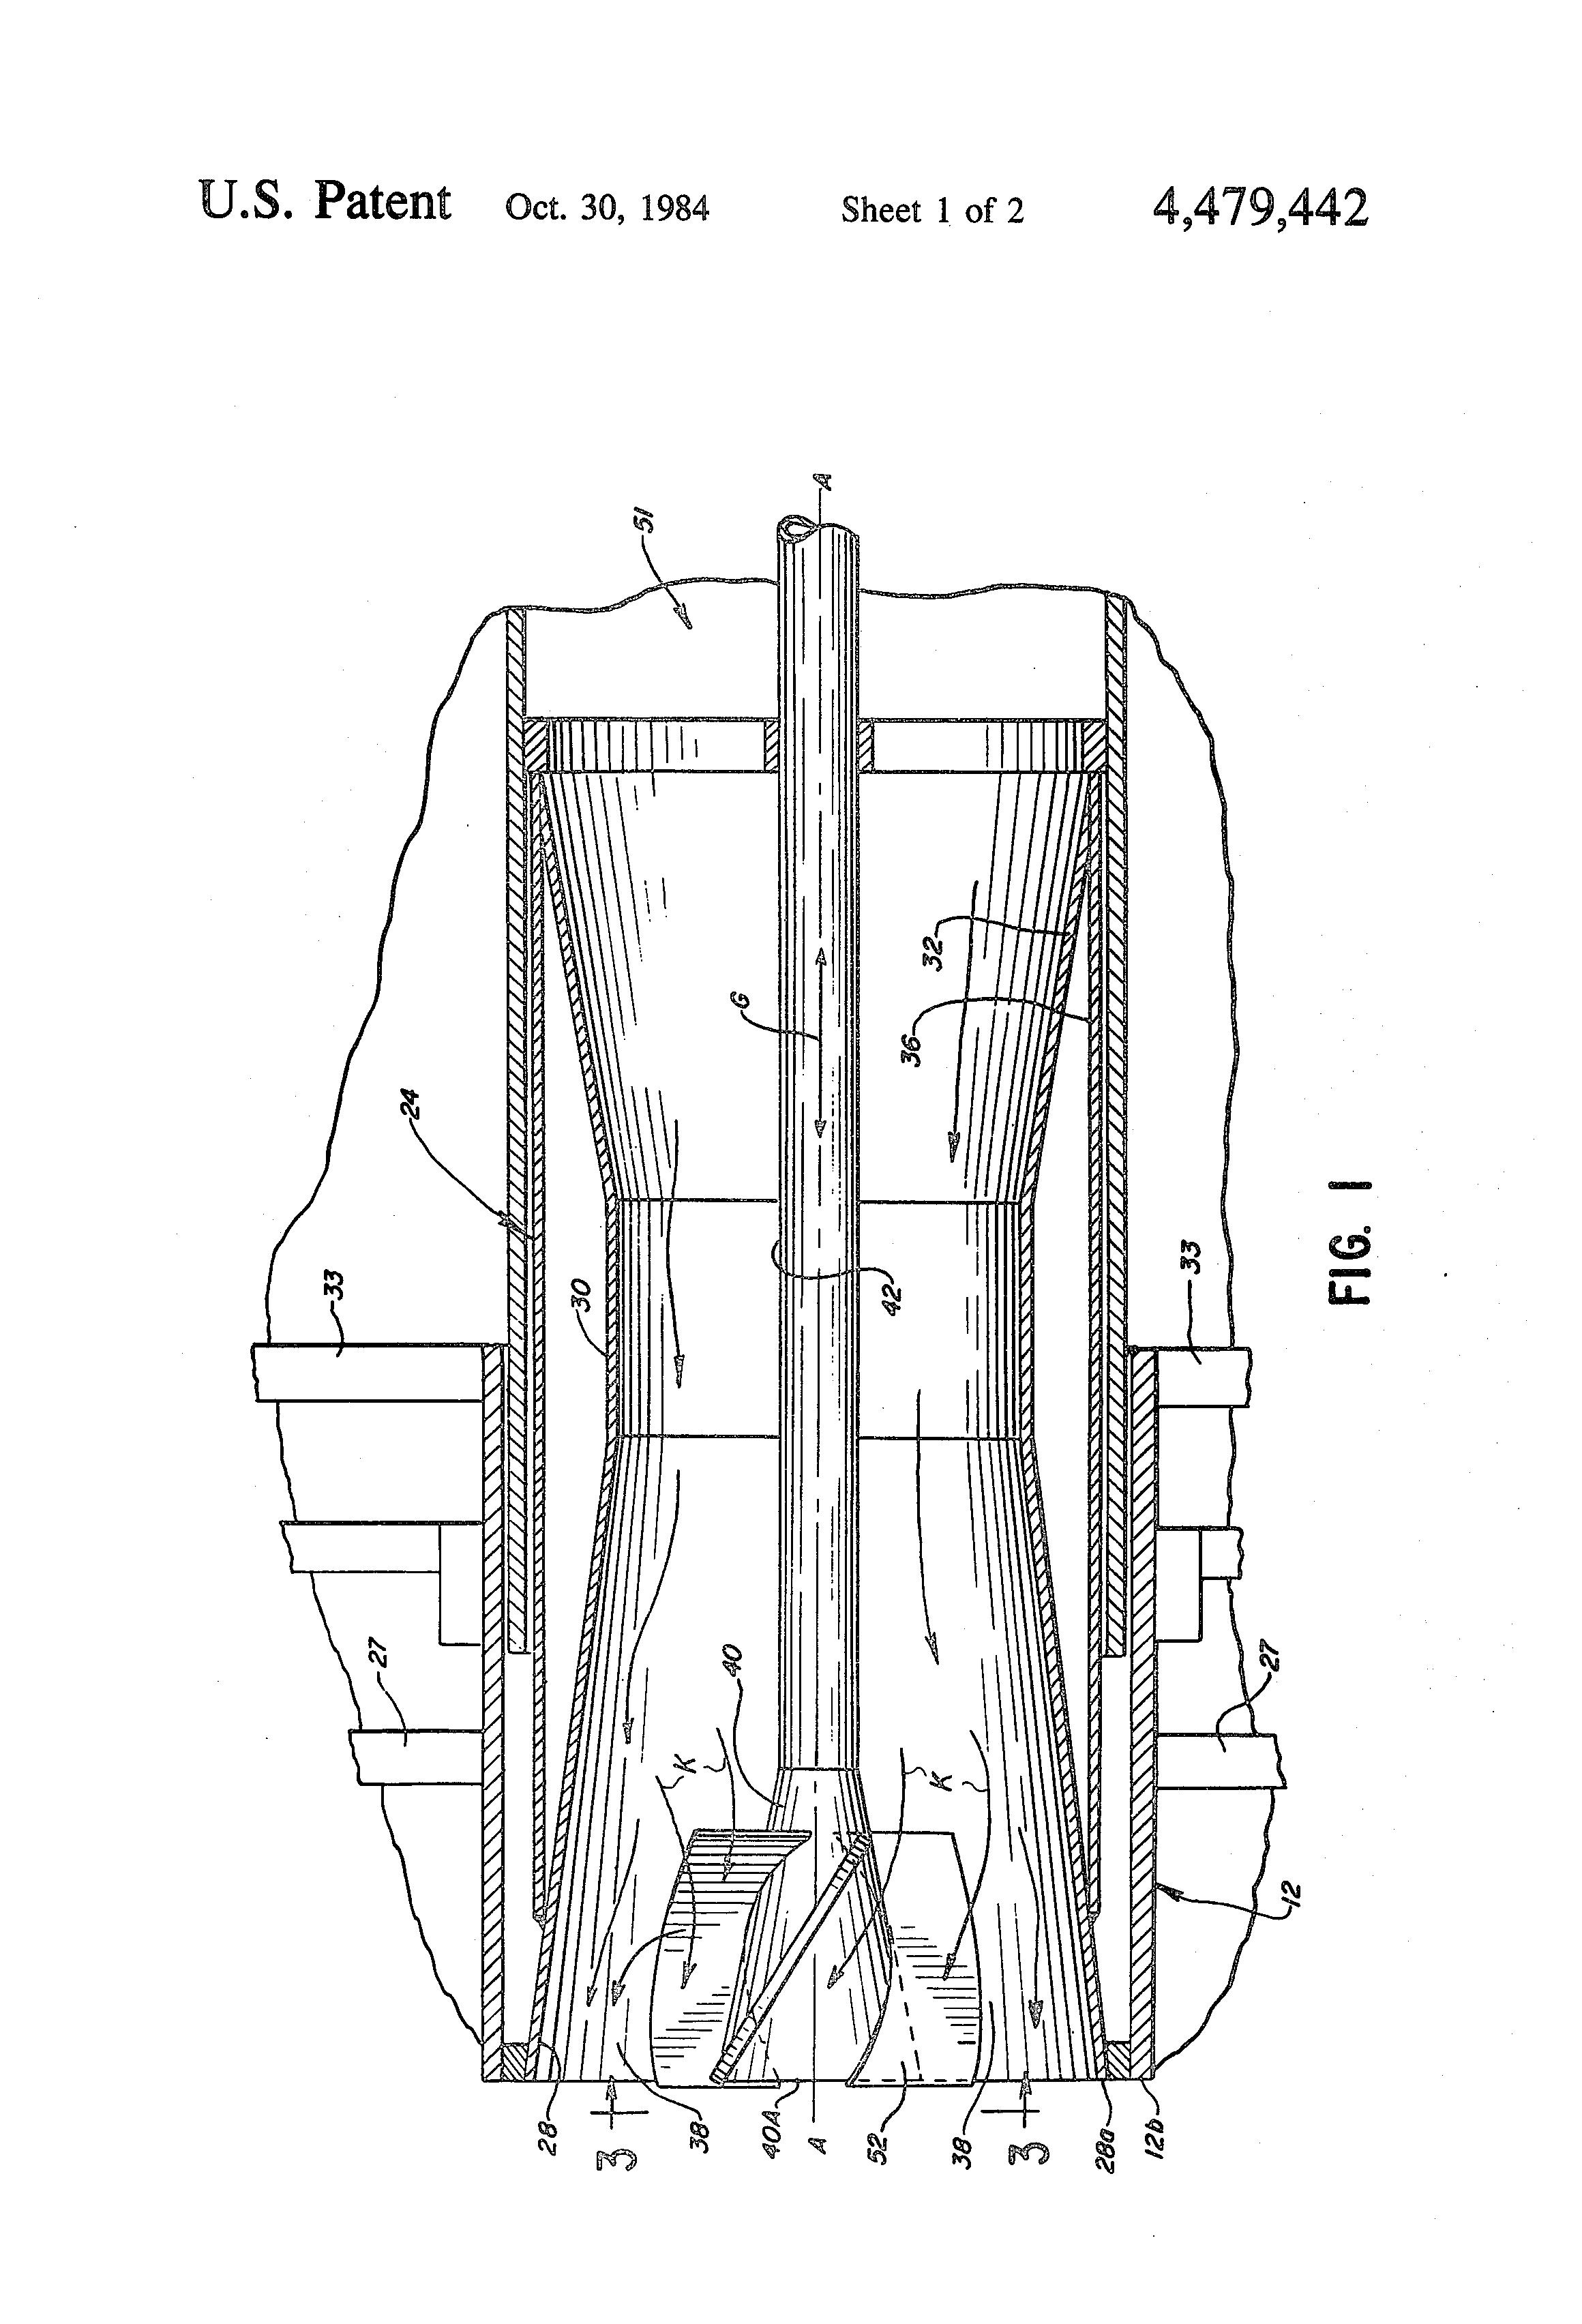 propane engine operation diagram html